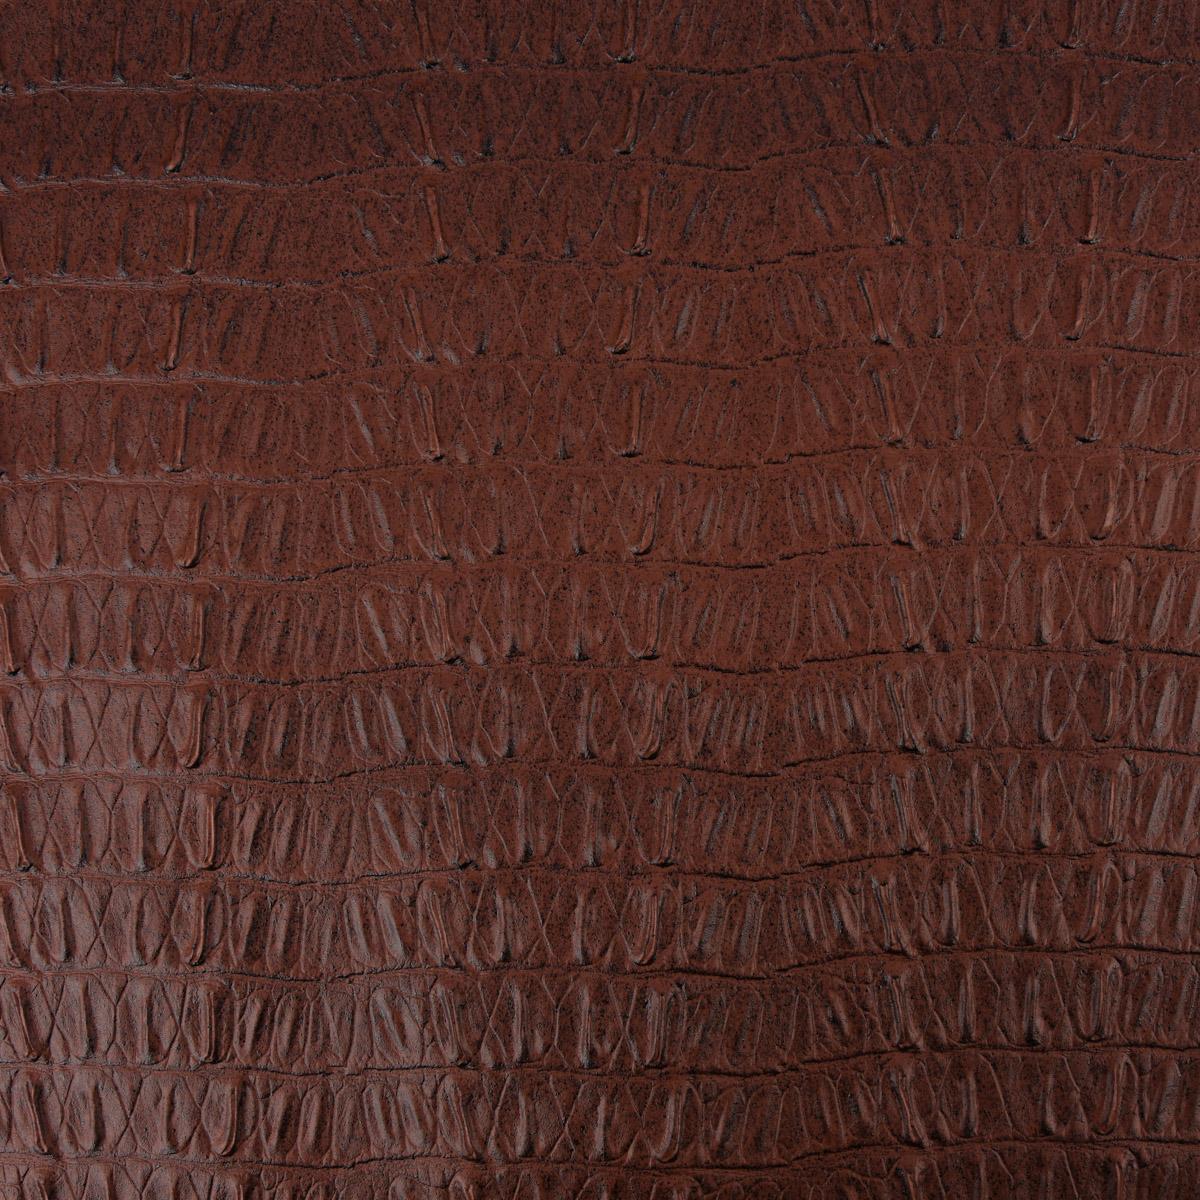 Kunstleder Lederimitat Krokodilhaut schokobraun 1,4m Breite